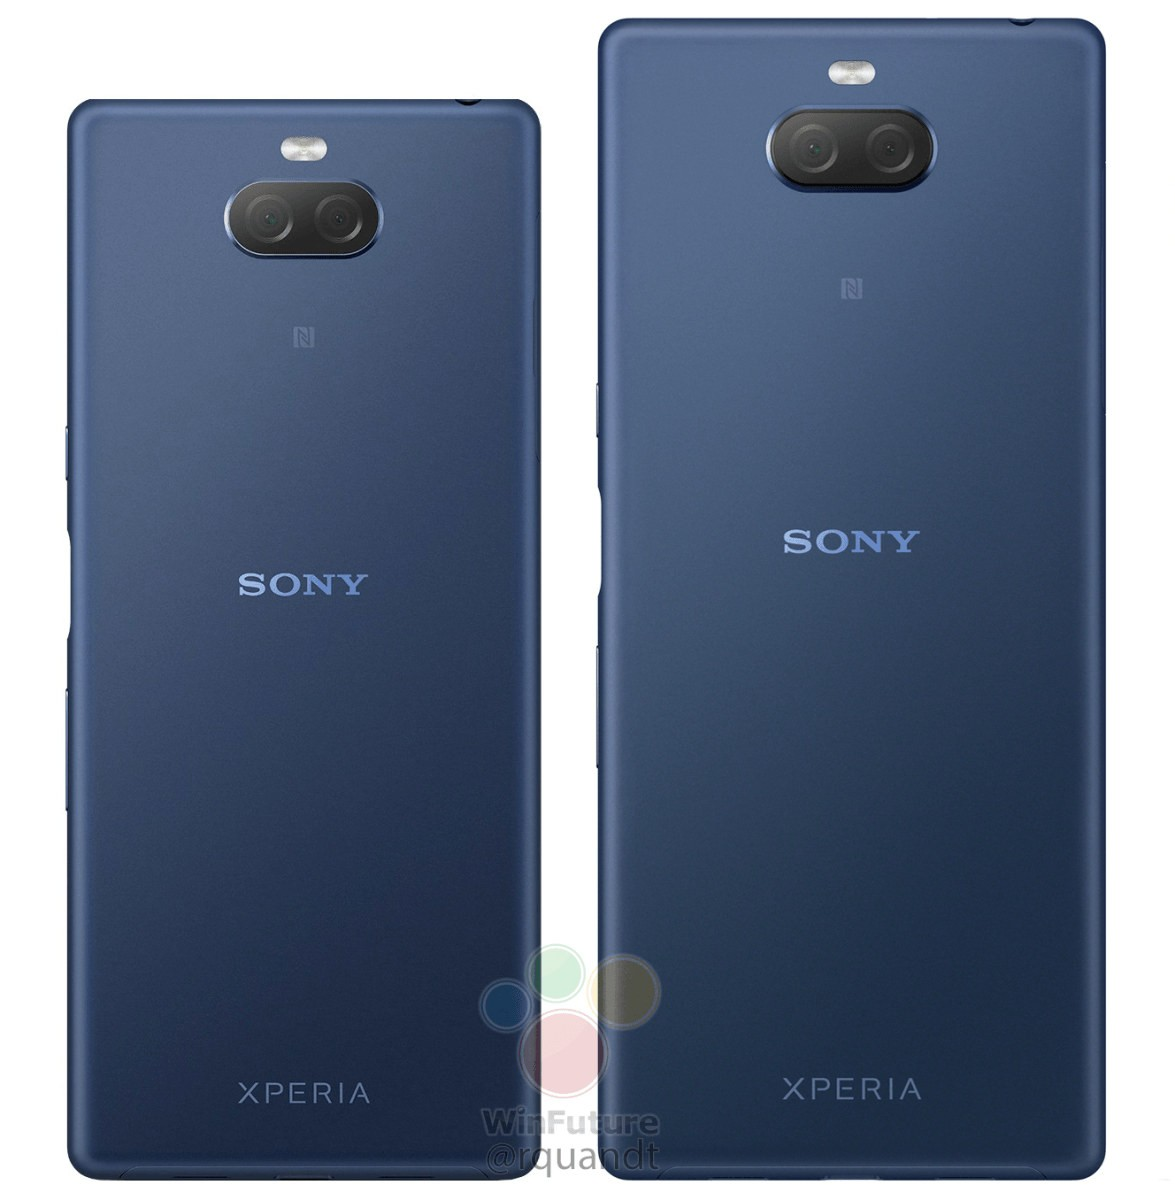 Sony Xperia 10 and Xperia 10Z